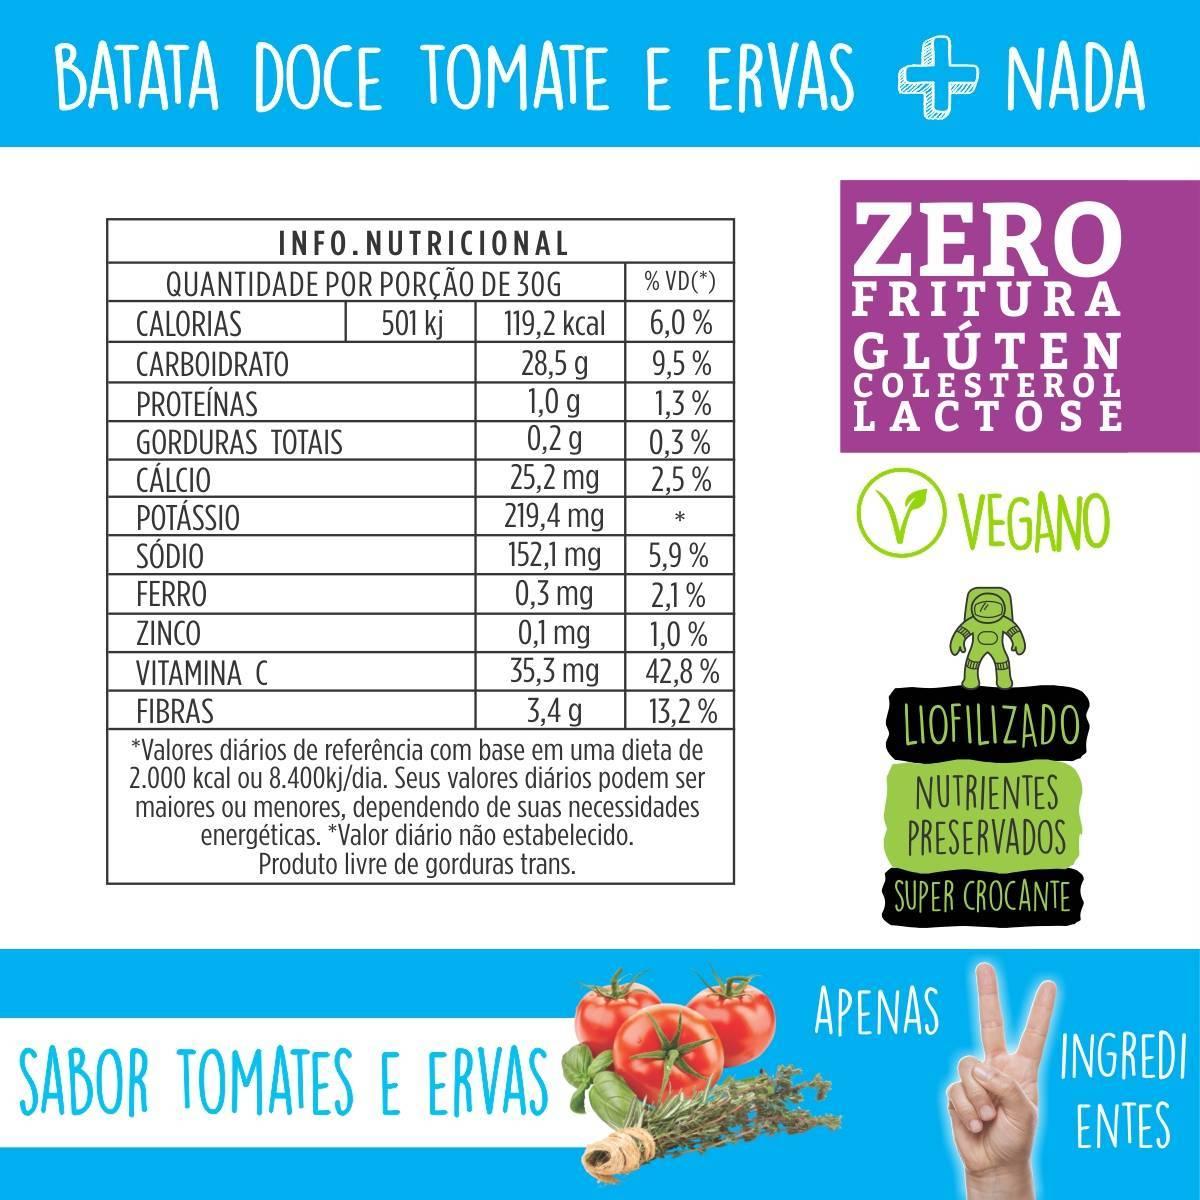 CHIPS DE BATATA DOCE LIOFILIZADA - SABOR TOMATE E ERVAS - 30g - QPod